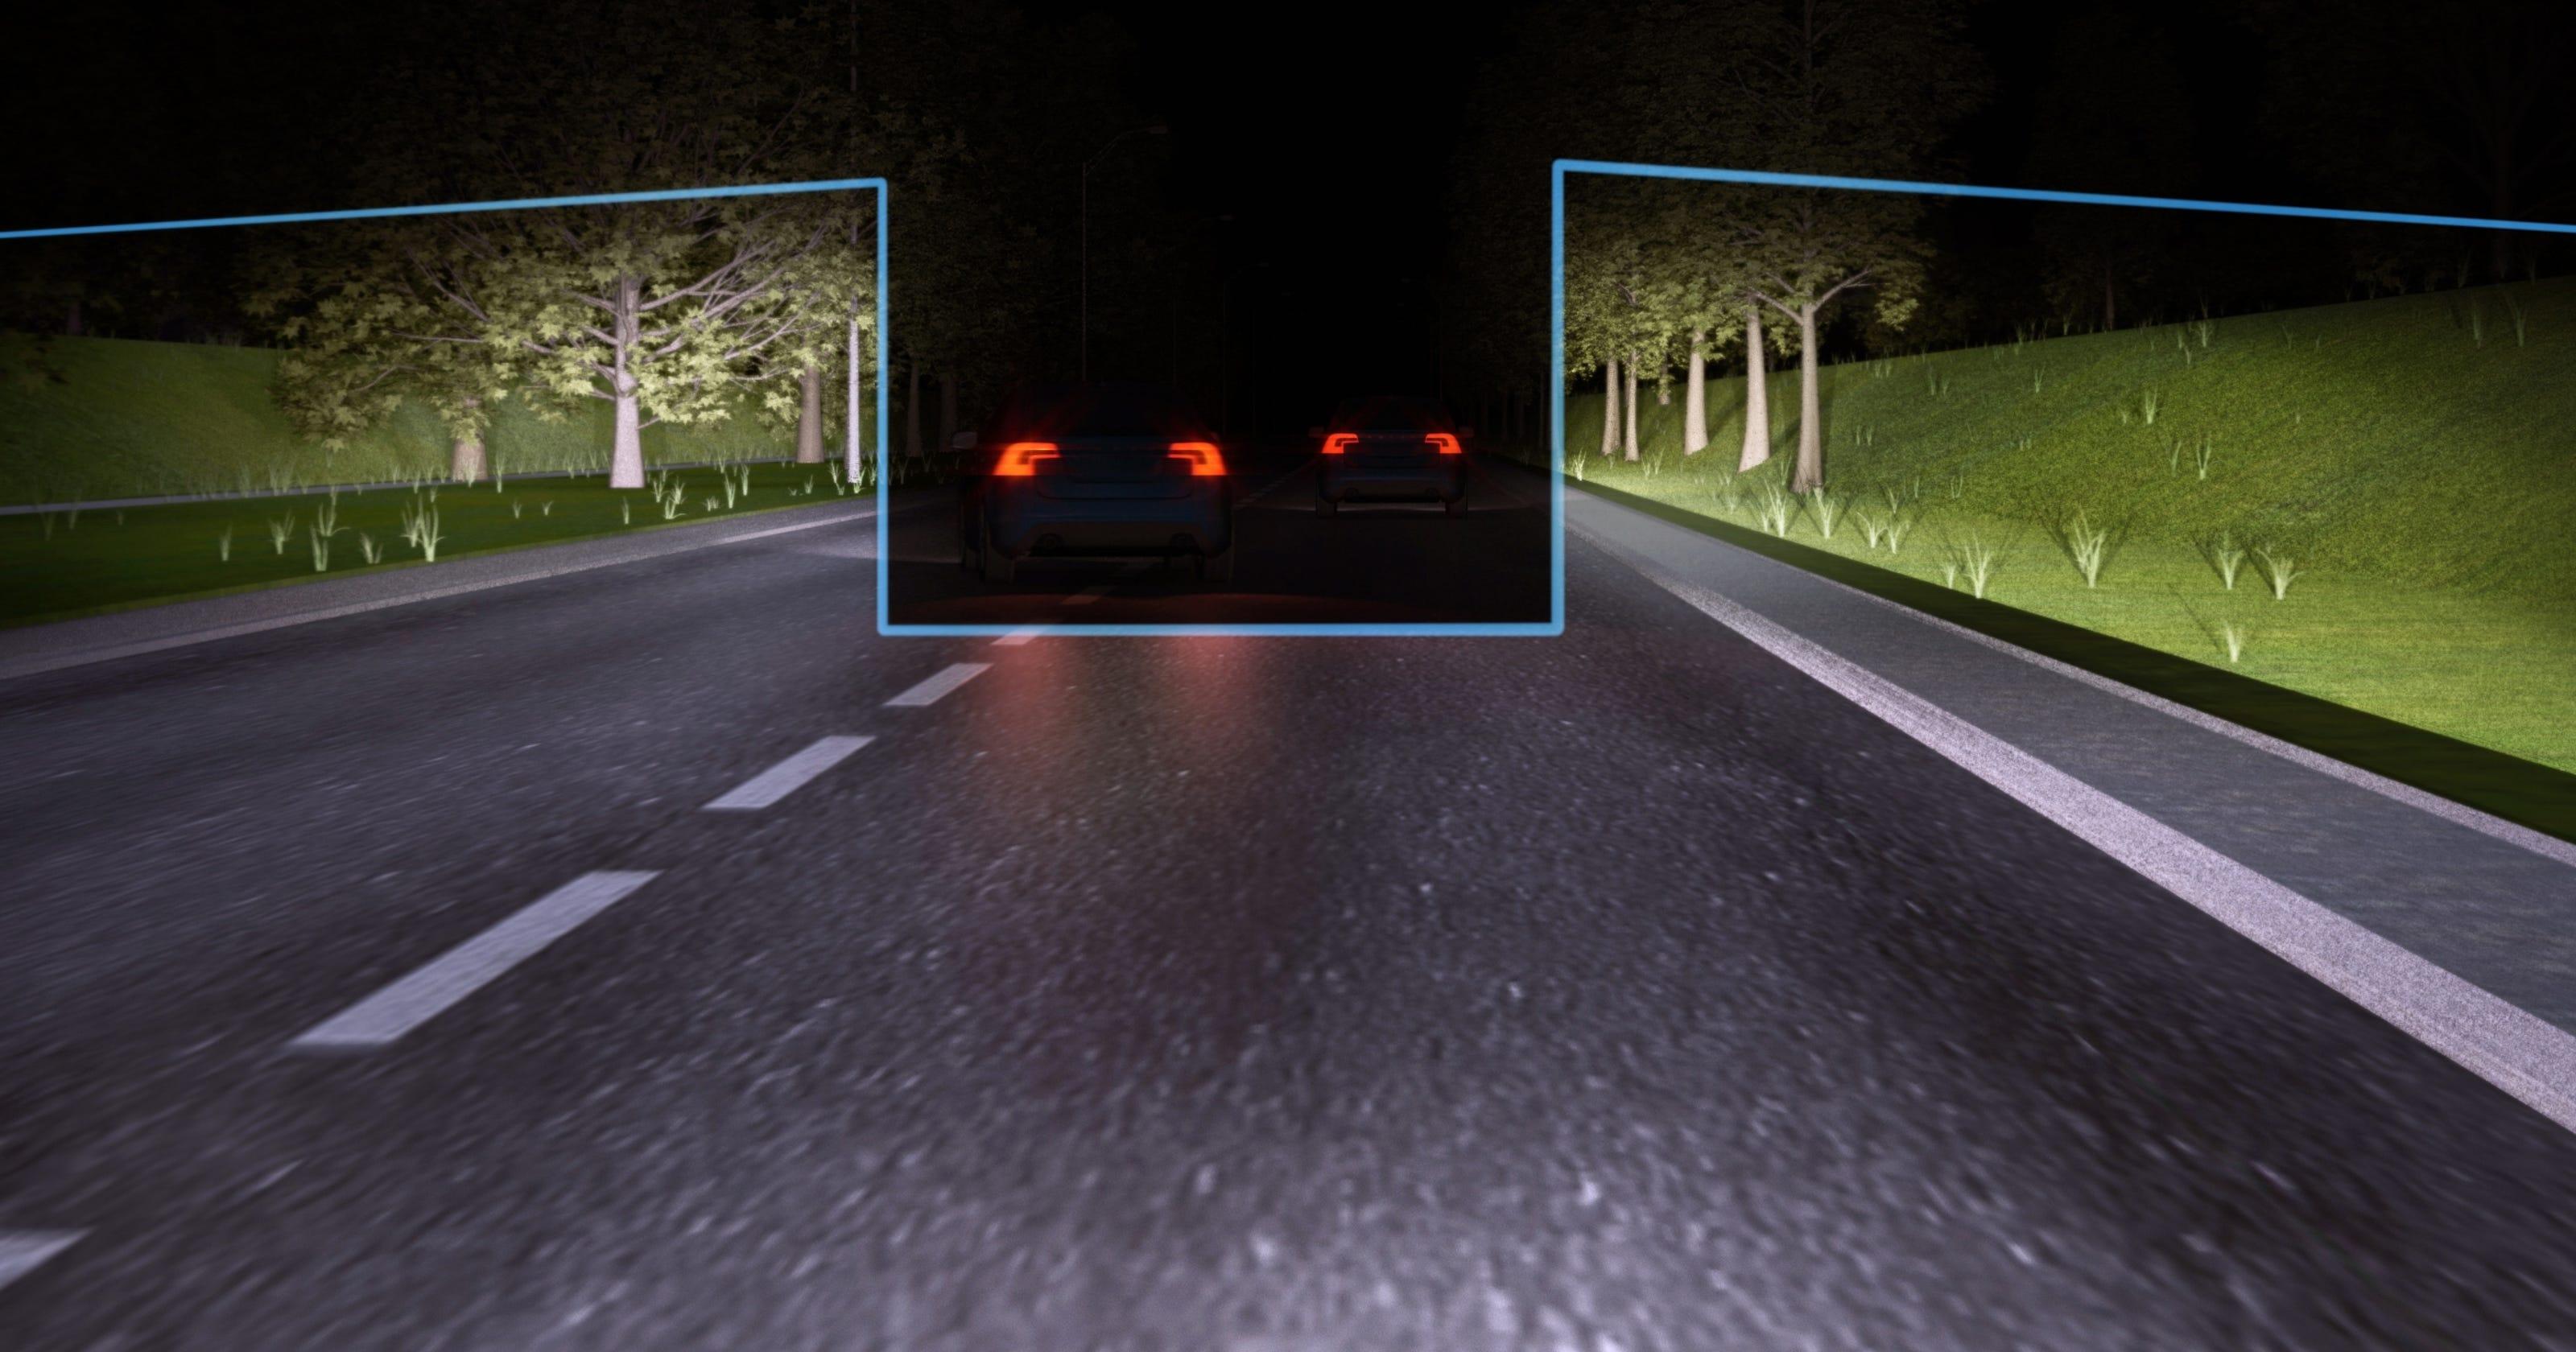 Cars' LED lighting revolution slowed by regulations